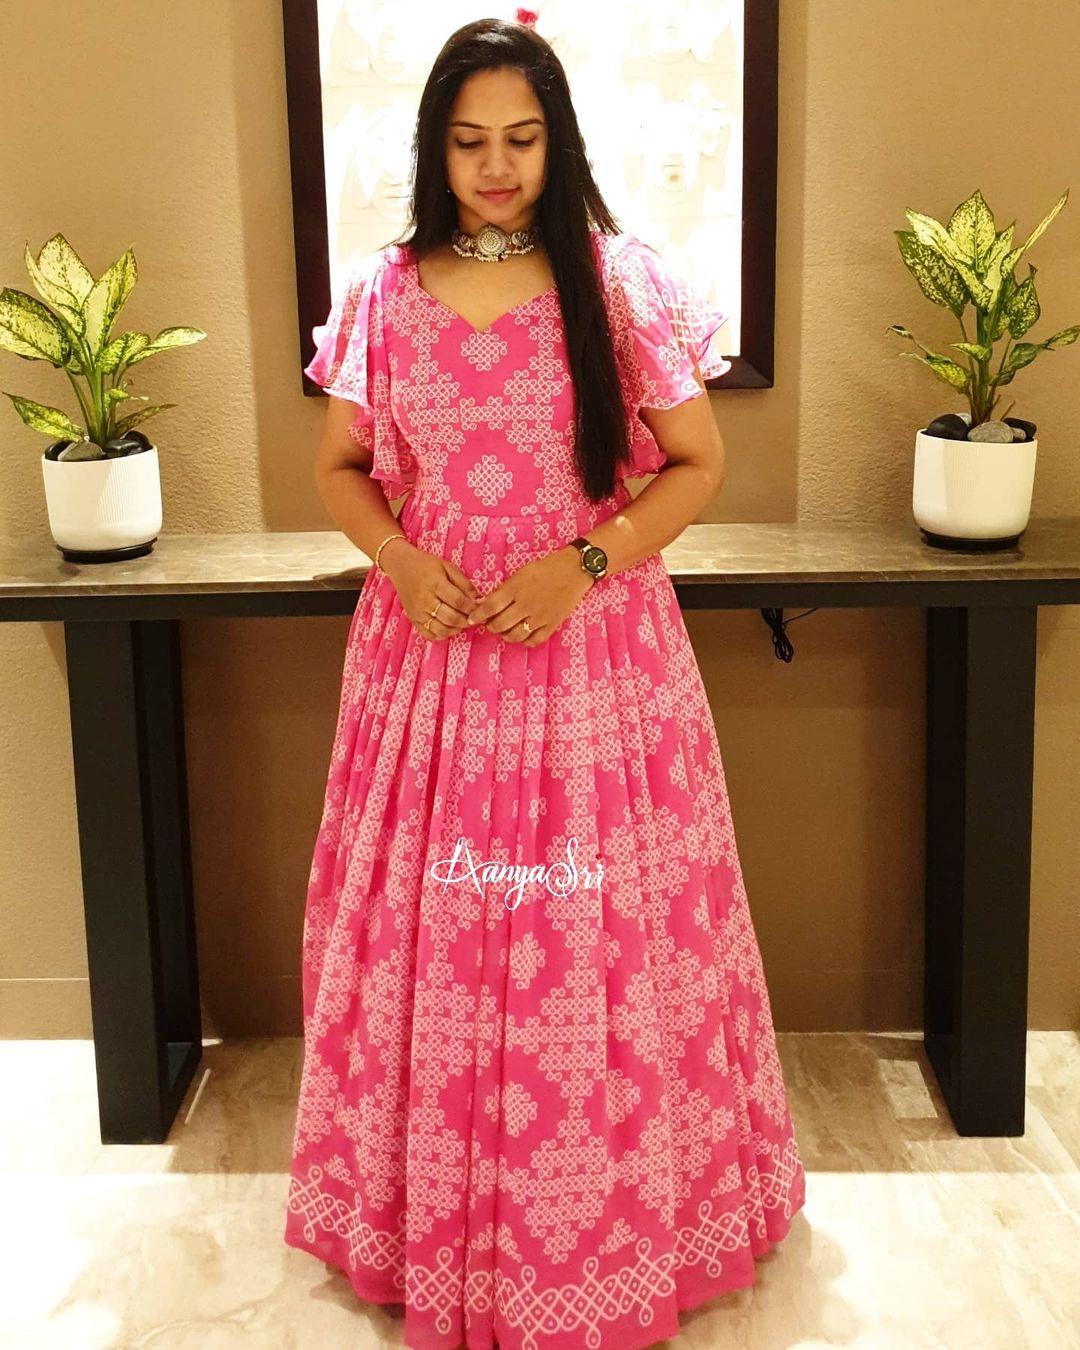 Pink Muggu. Gorgeous blush pink color floor length dress with muggu design. Dress with ruffle sleeves. 2021-01-19